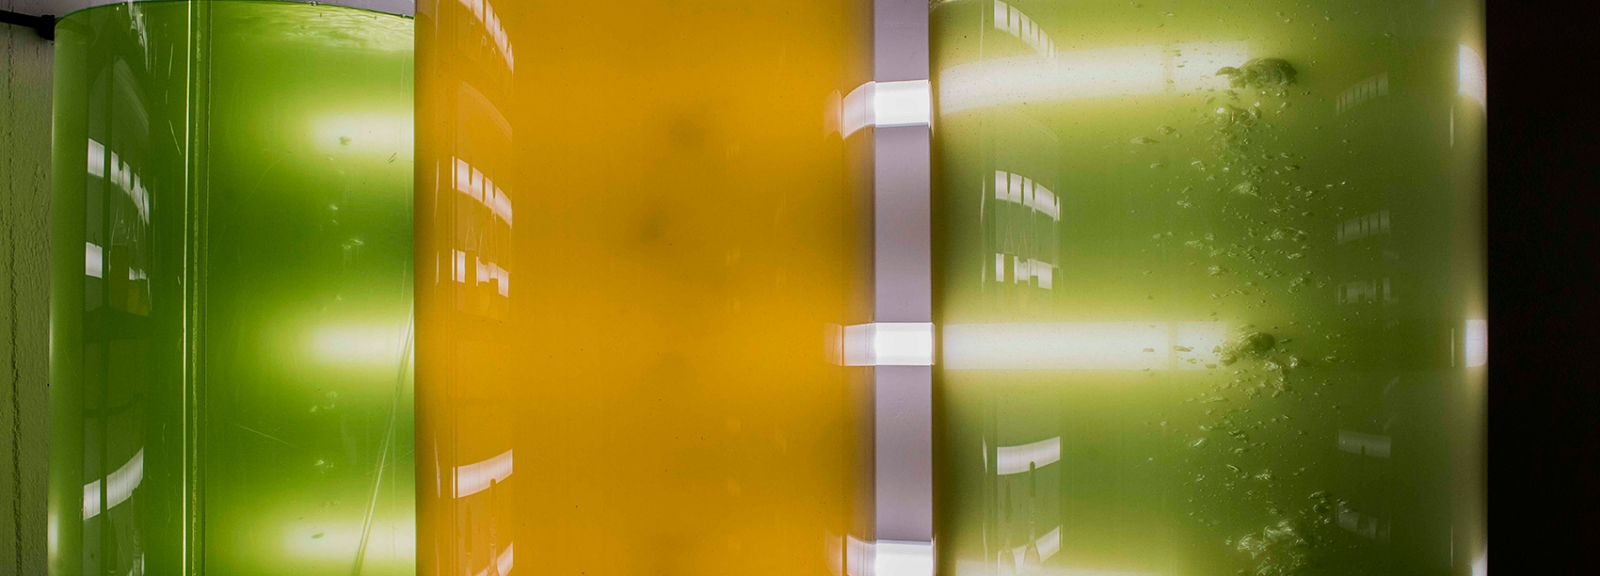 Élevage de micro-algues au Marinarium de Concarneau © MNHN - Agnès Iatzoura